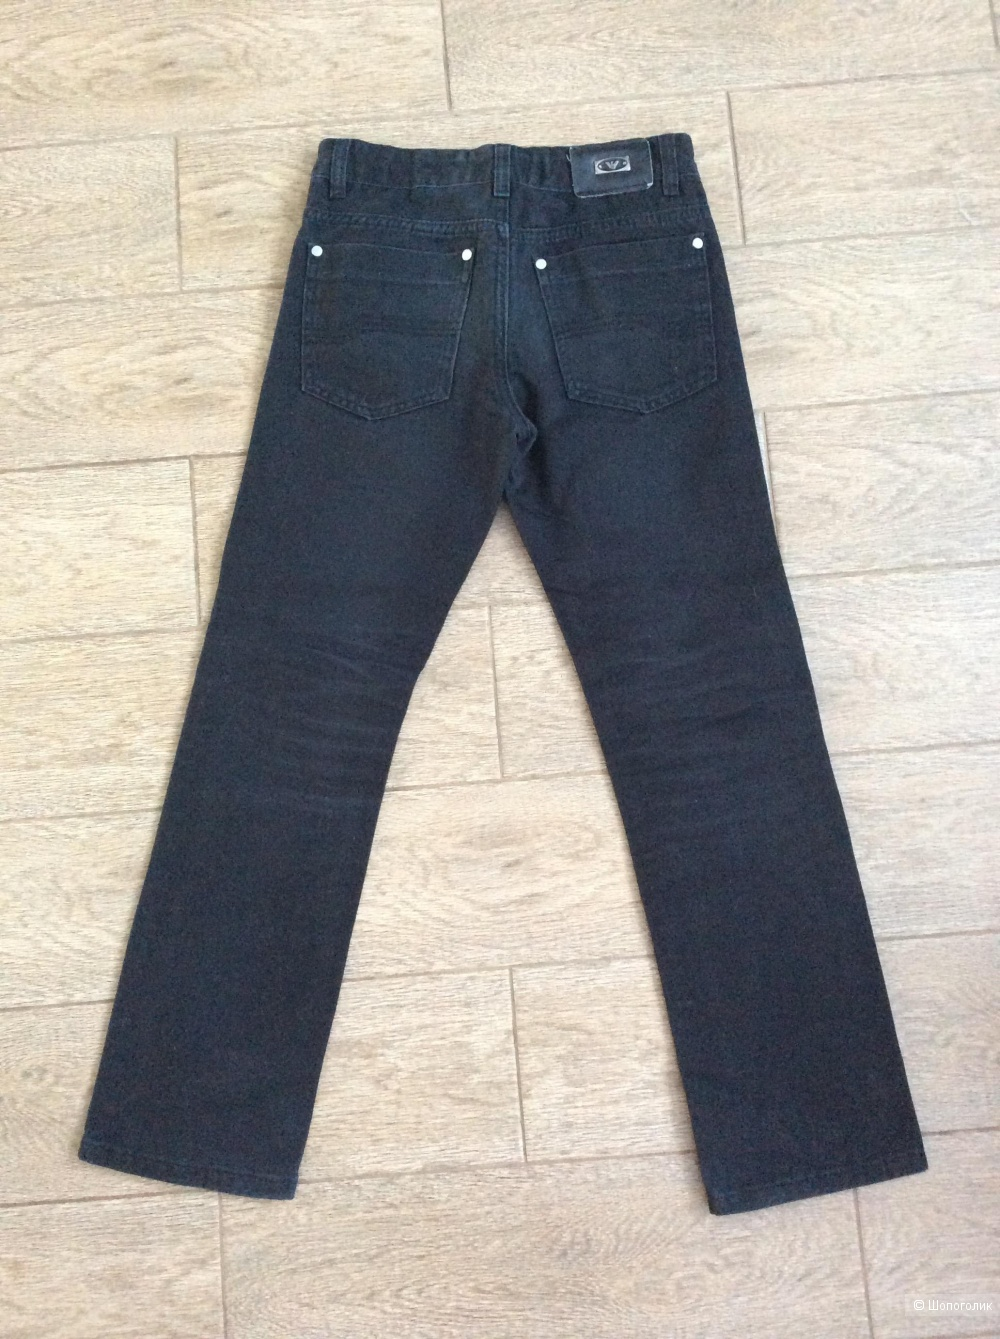 Джинсы Armani Jeans р.12-13 (на рост 145-150 см)